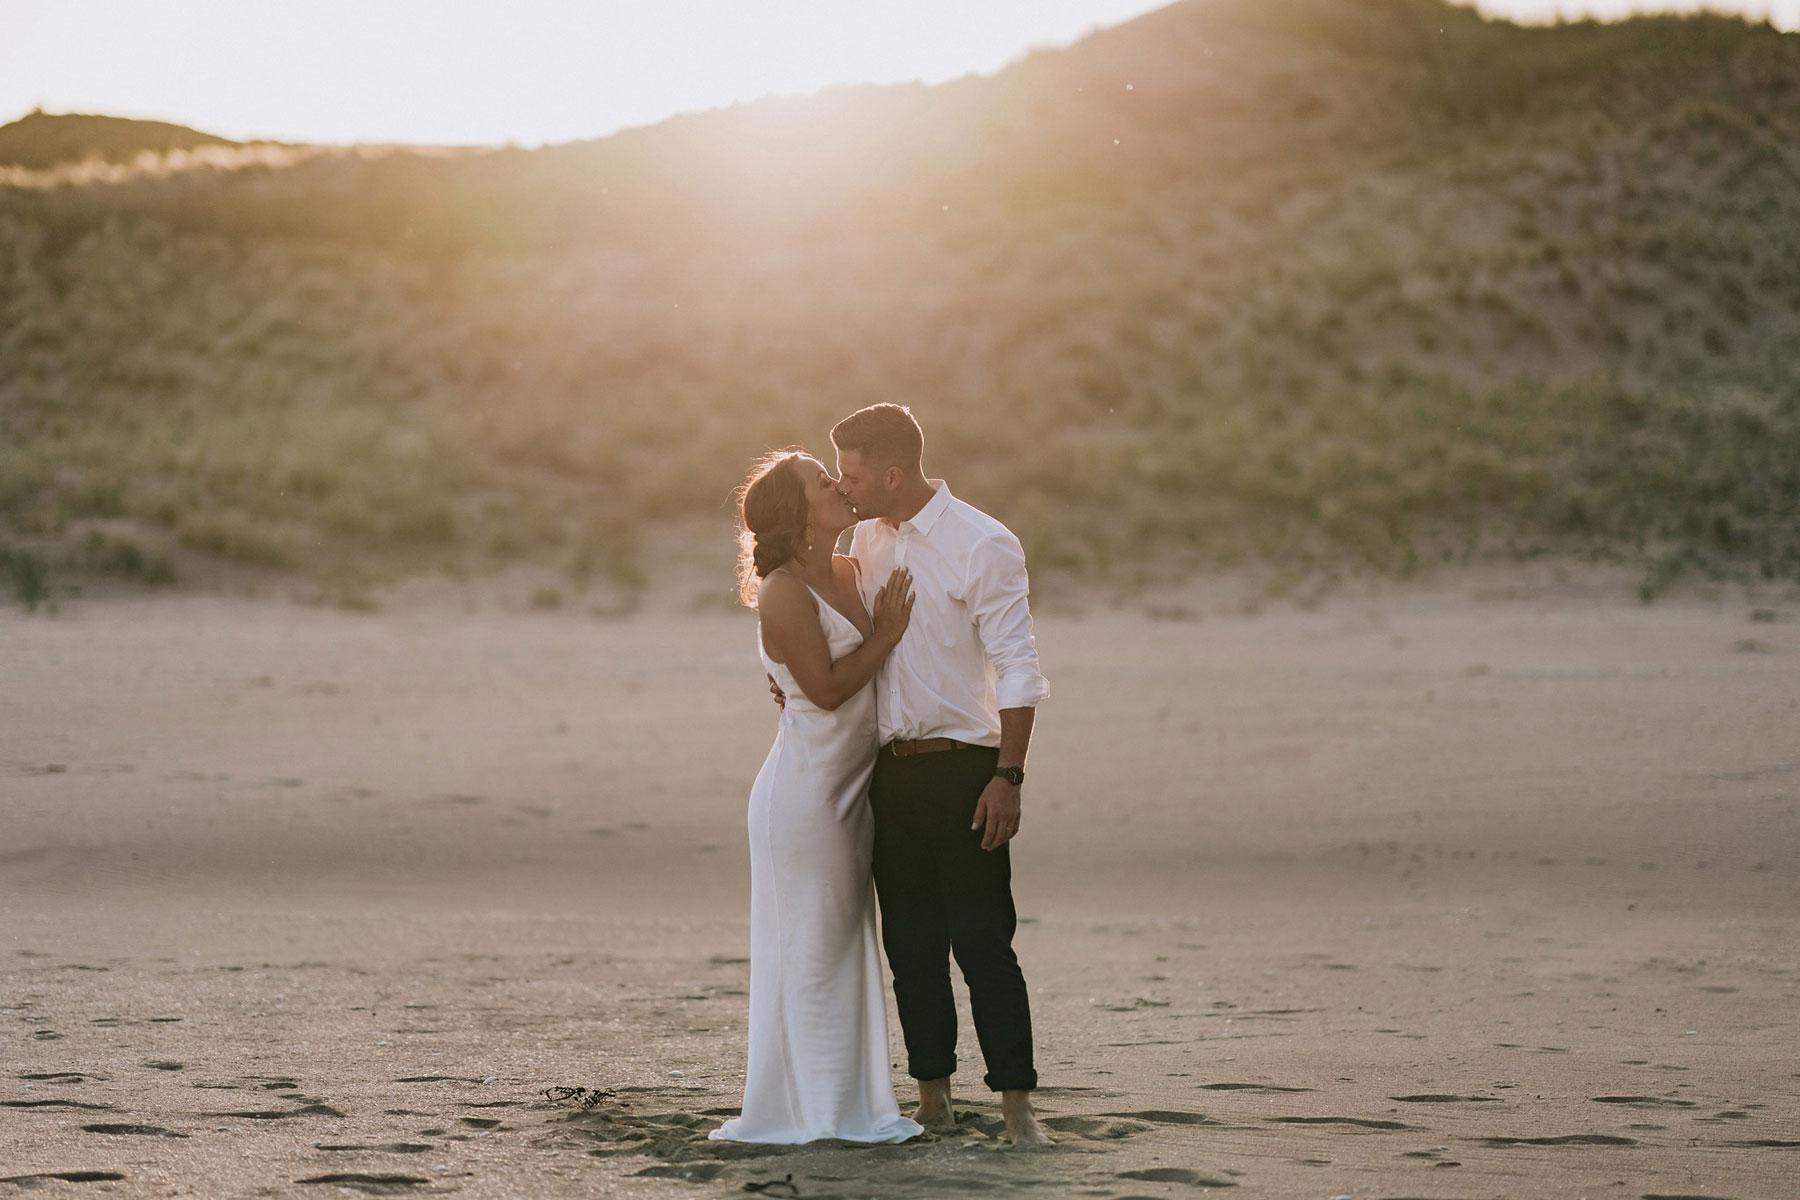 newfound-j-n-orua-beach-house-coromandel-wedding-photographers-724-1